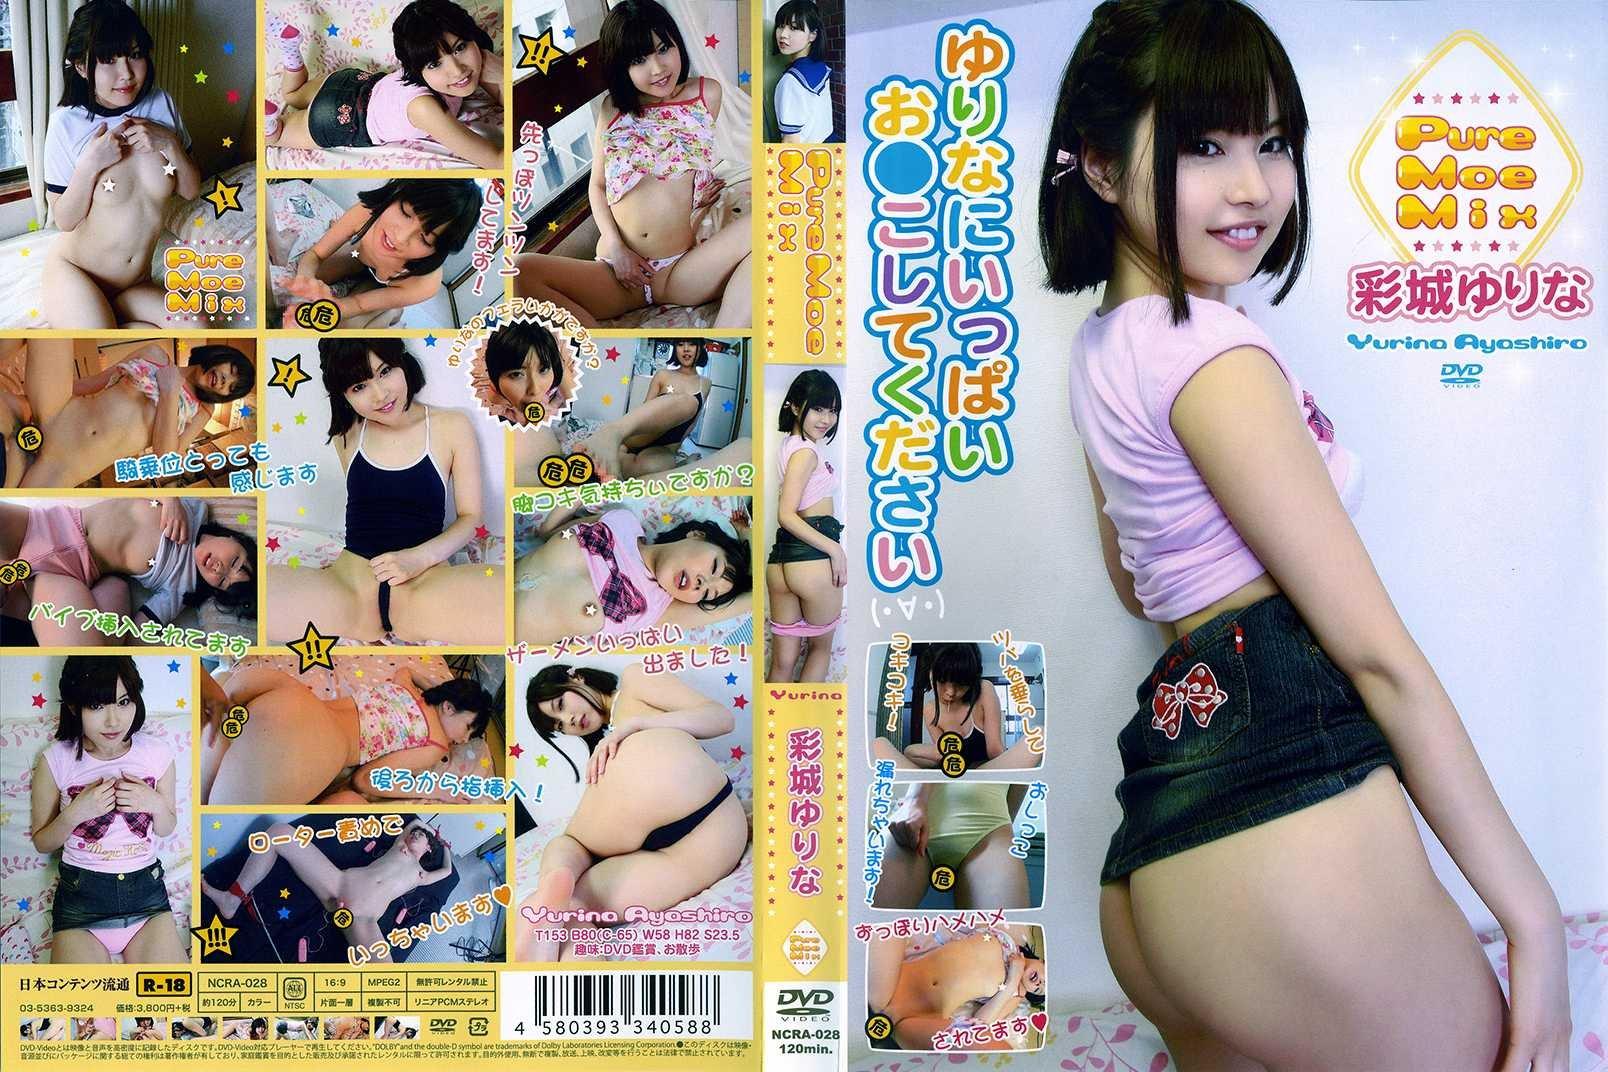 Yurina Ayashiro - Pure Moe Mix